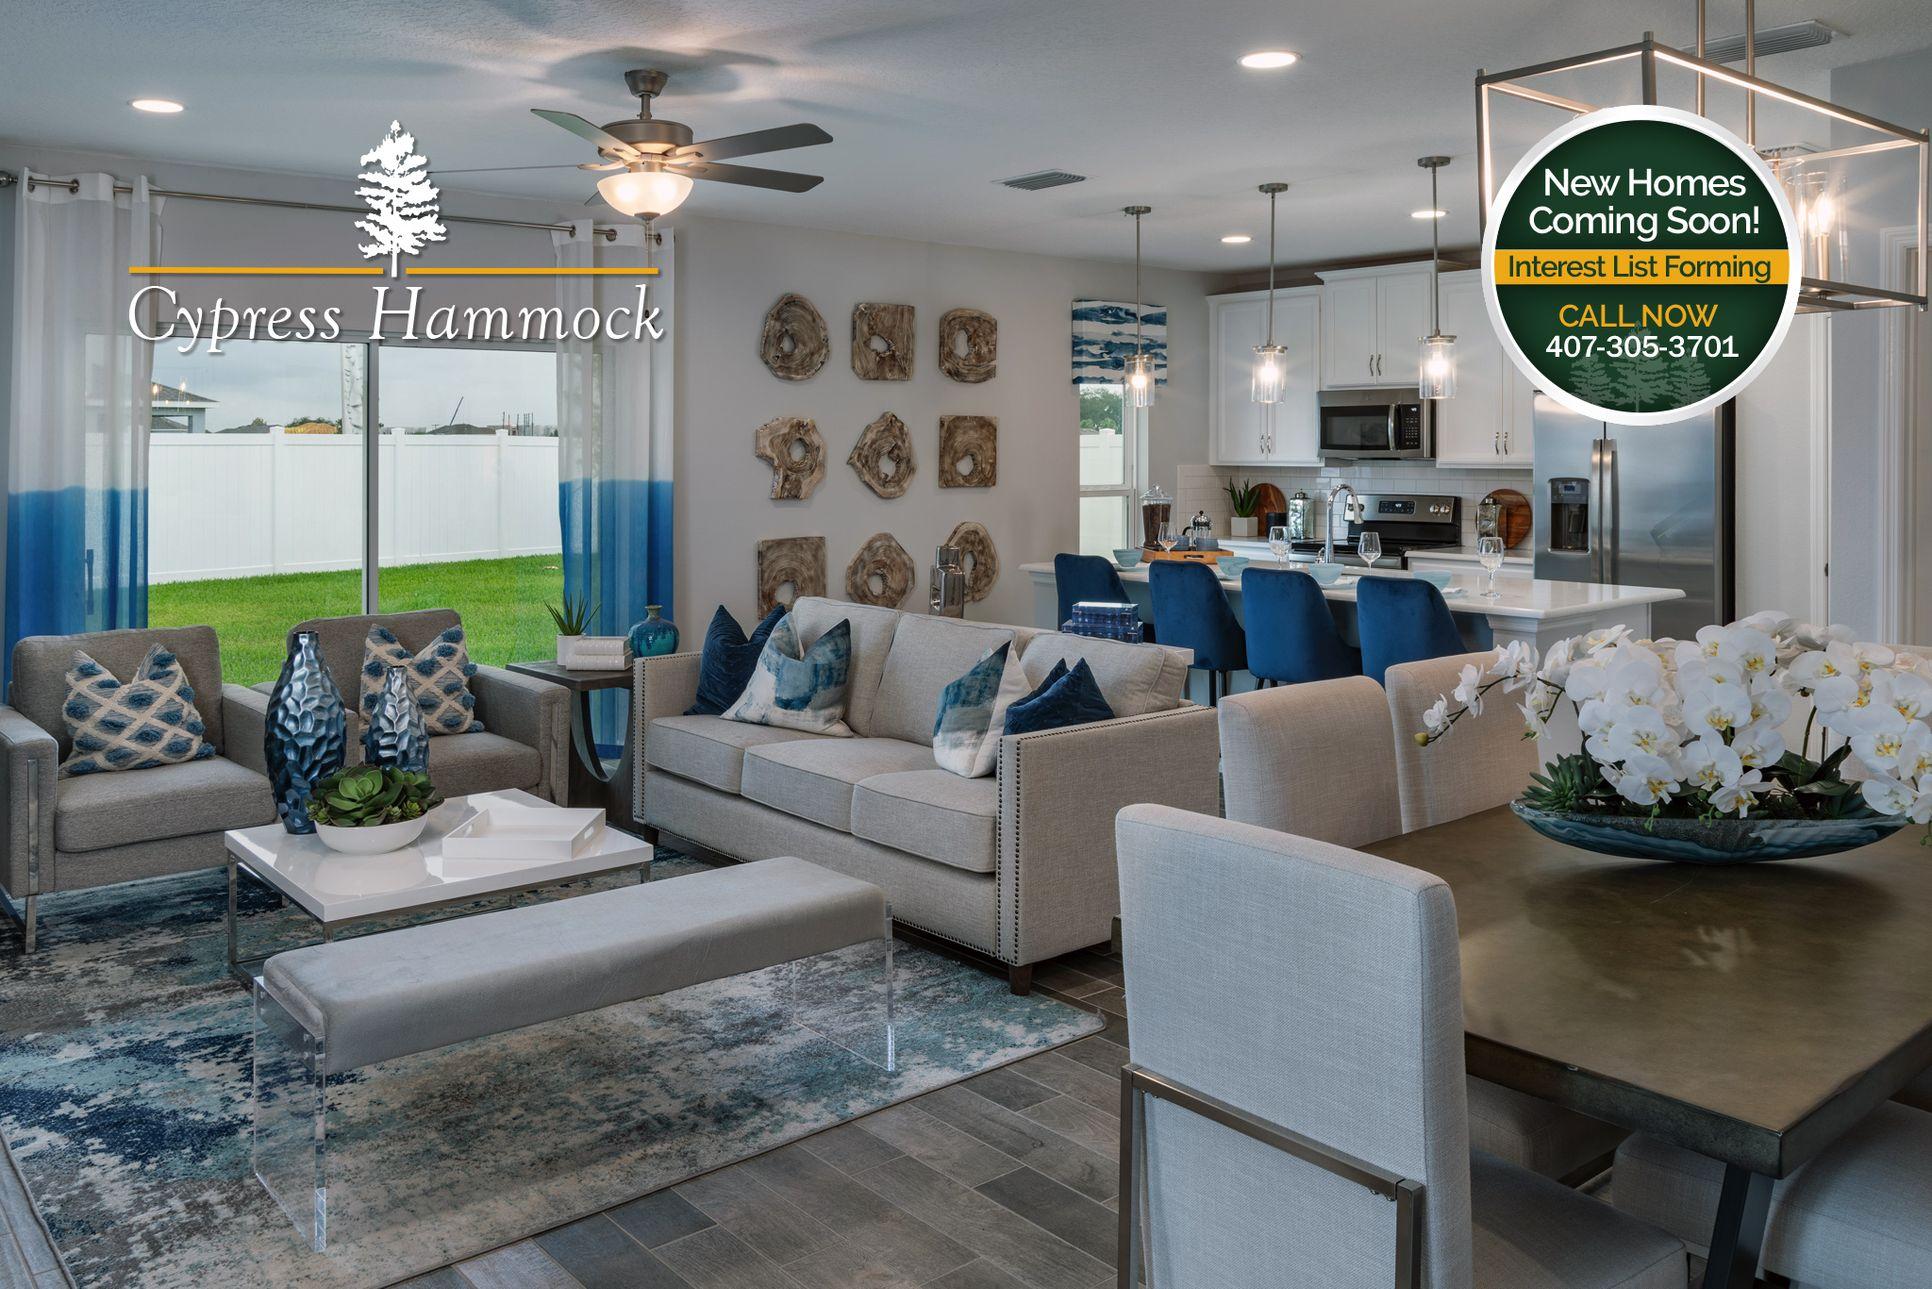 Cypress Hammock, Kissimmee